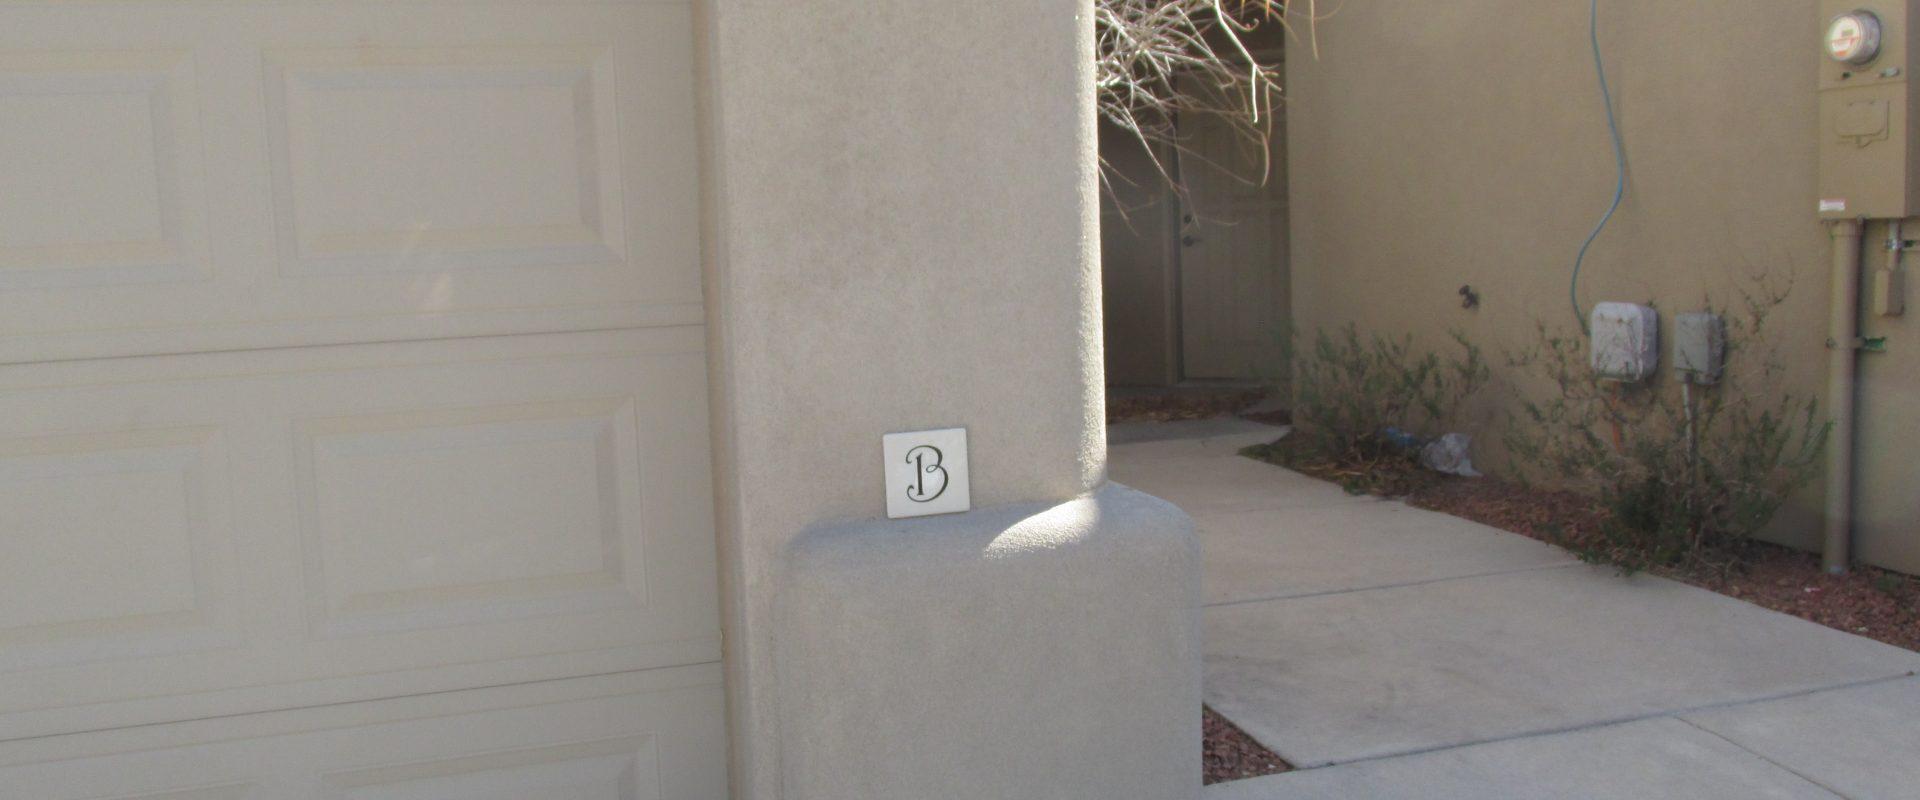 1262 Mission Nuevo Dr. #B, Las Cruces, New Mexico, 88011